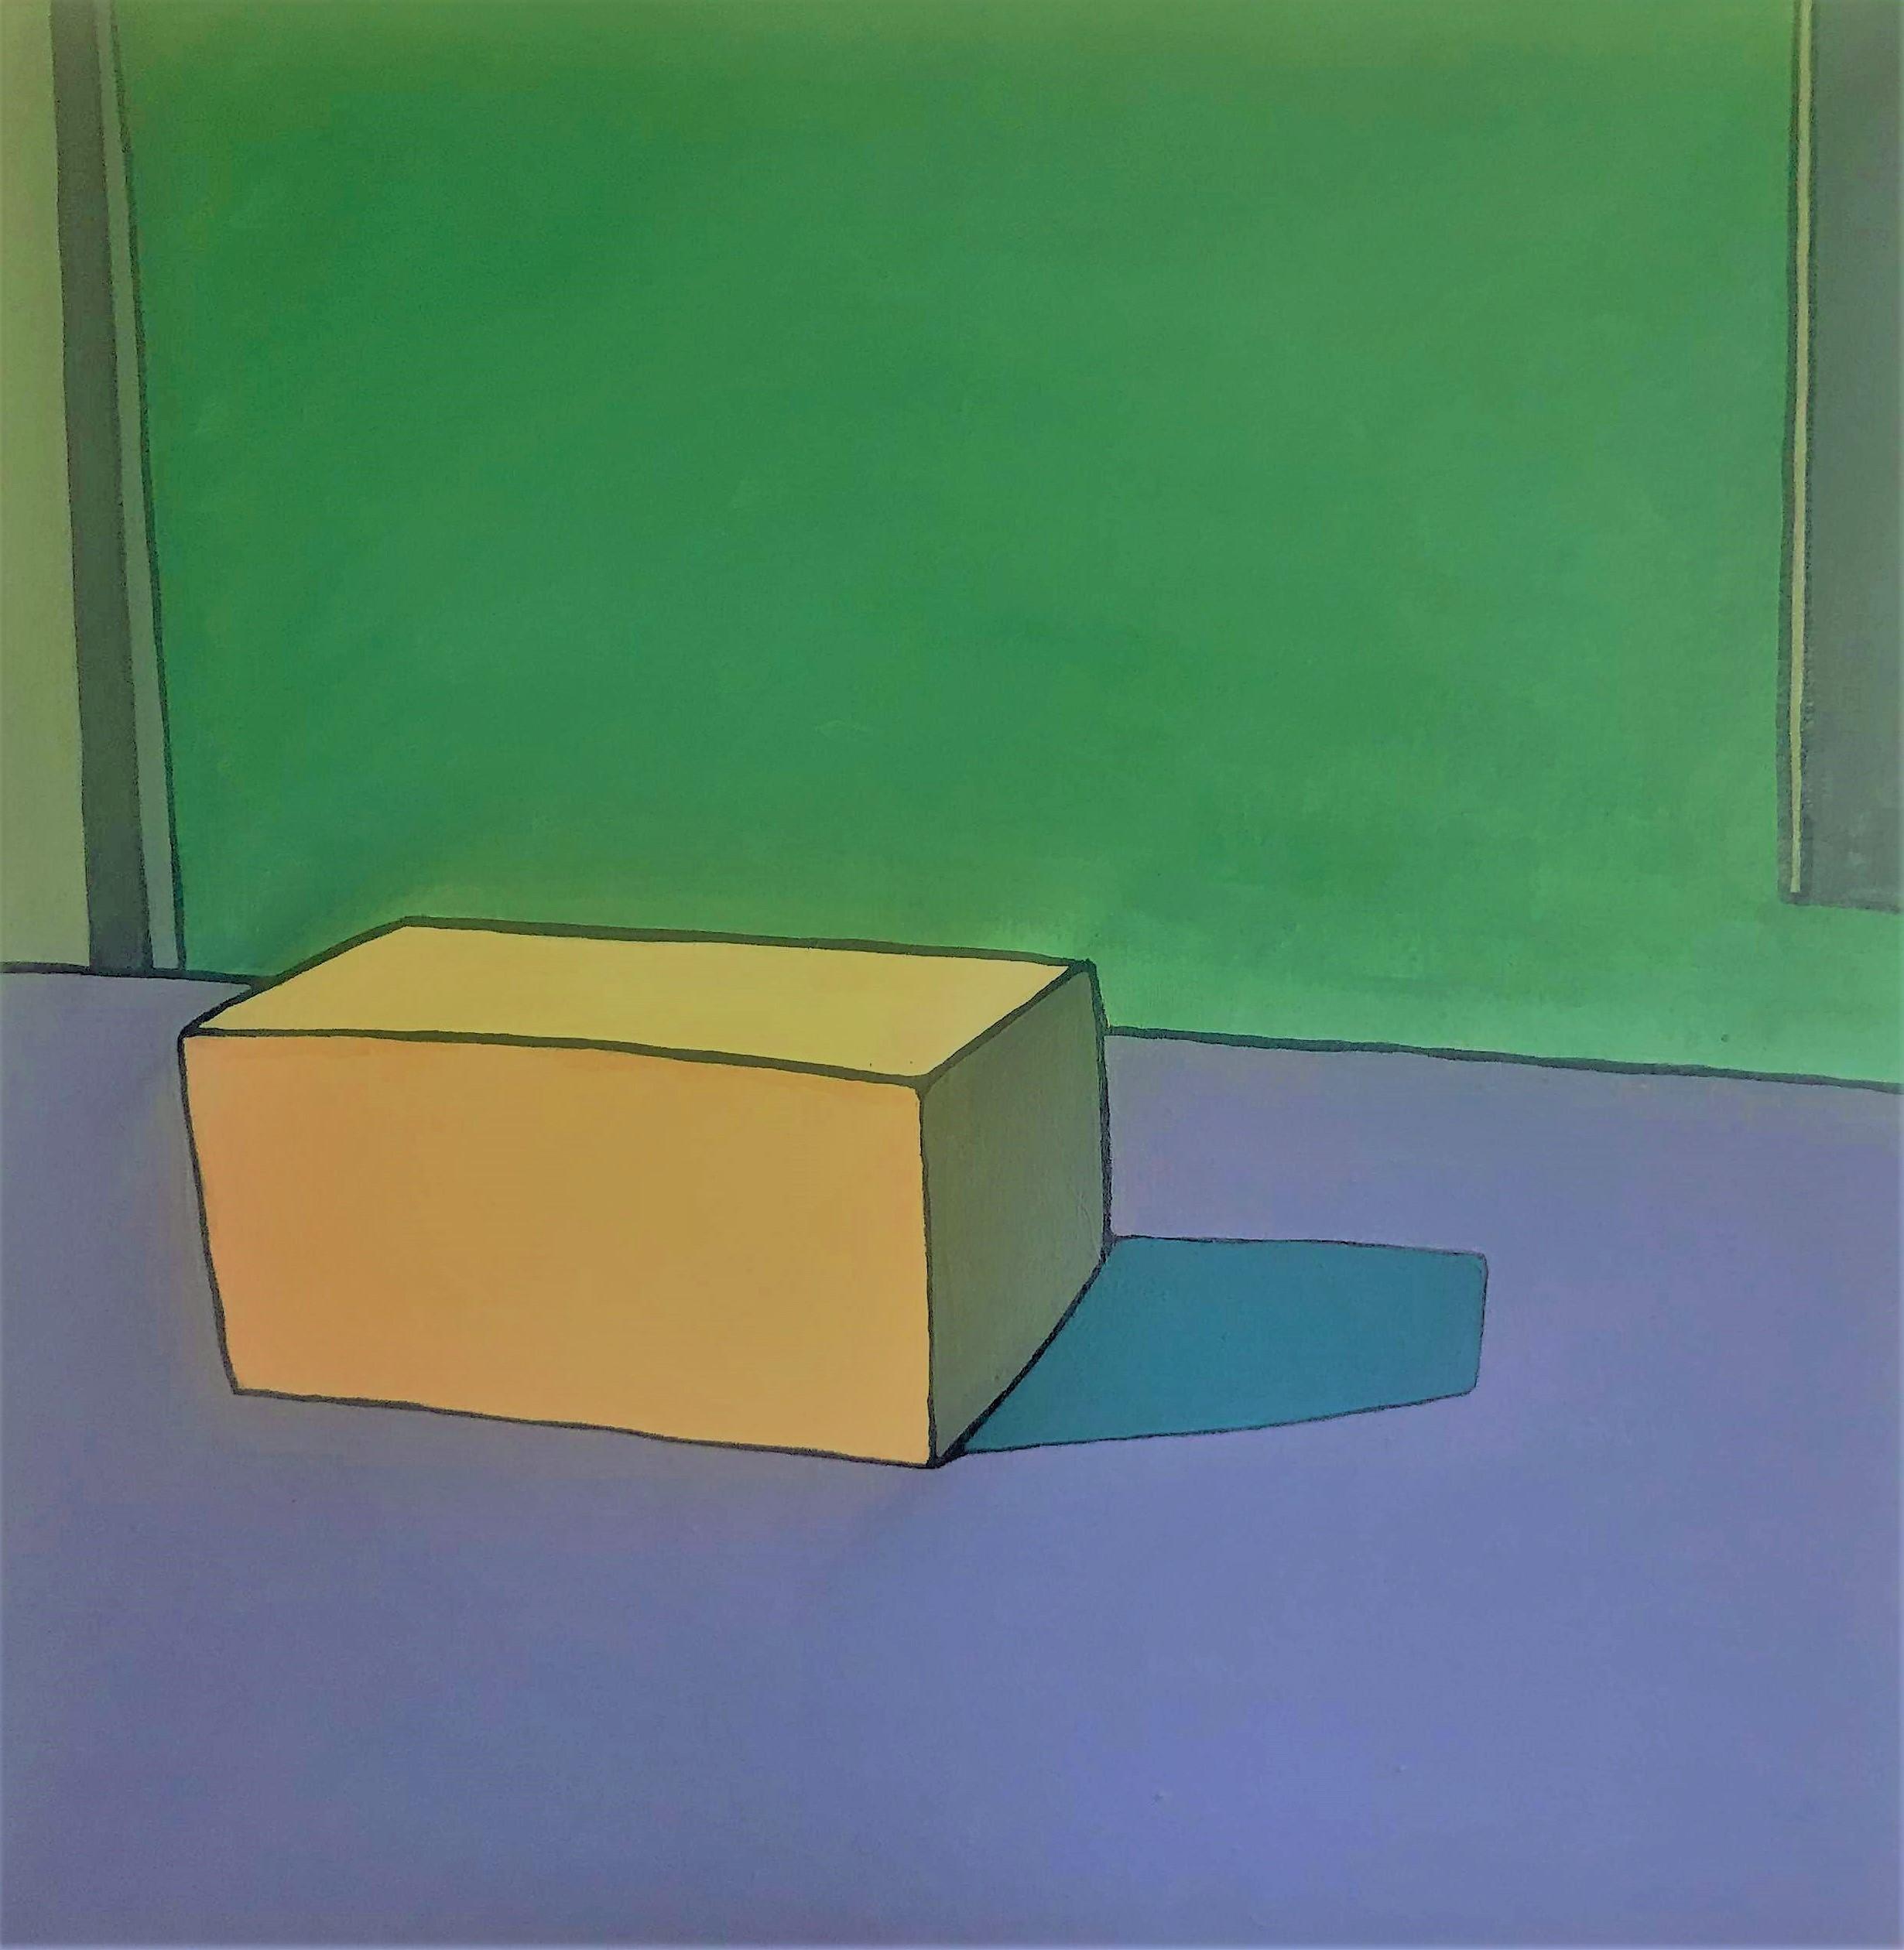 Block - Acrylic 2017